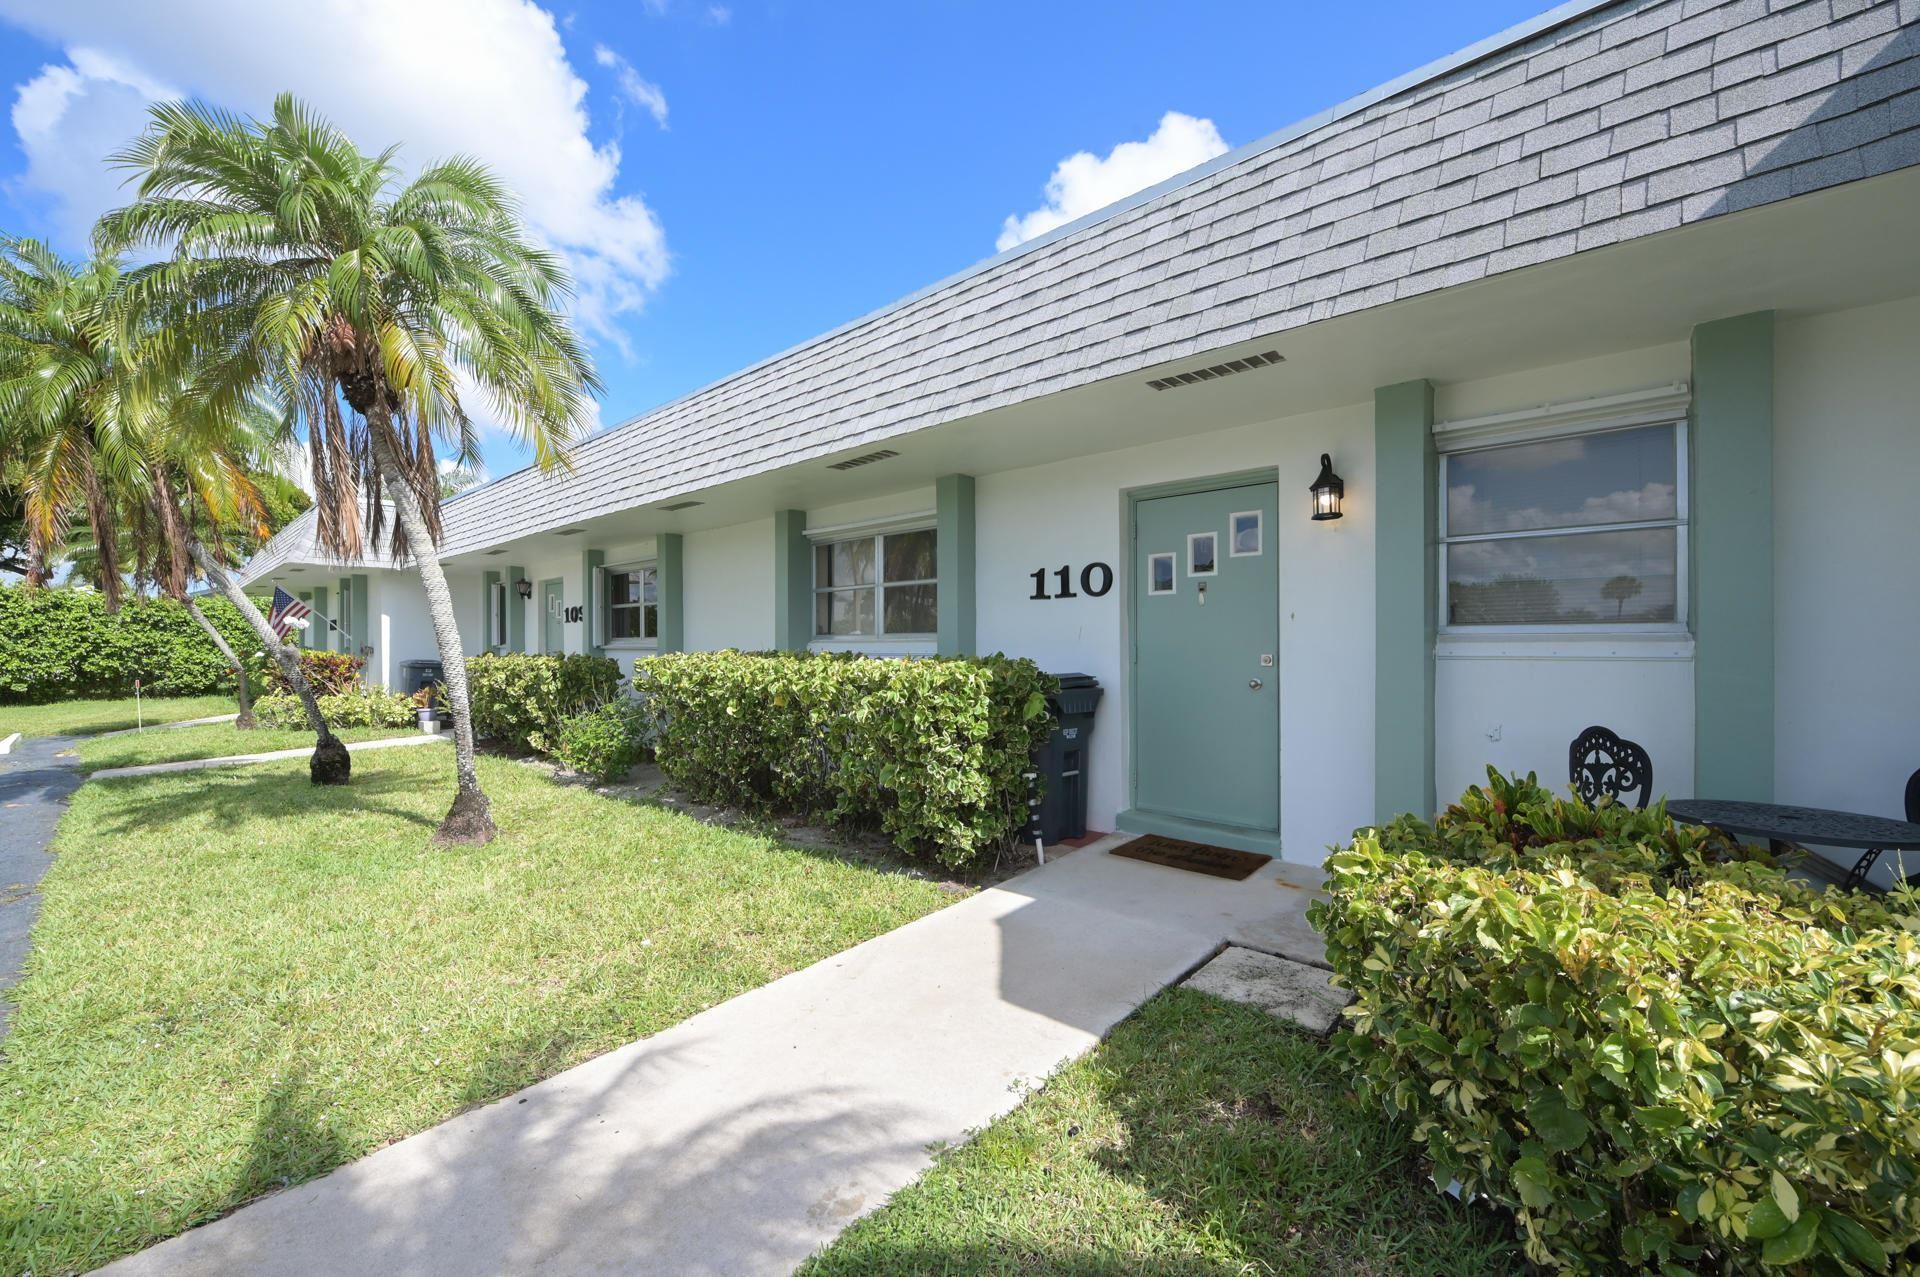 2638 Gately Drive E #110, West Palm Beach, FL 33415 - MLS#: RX-10715691